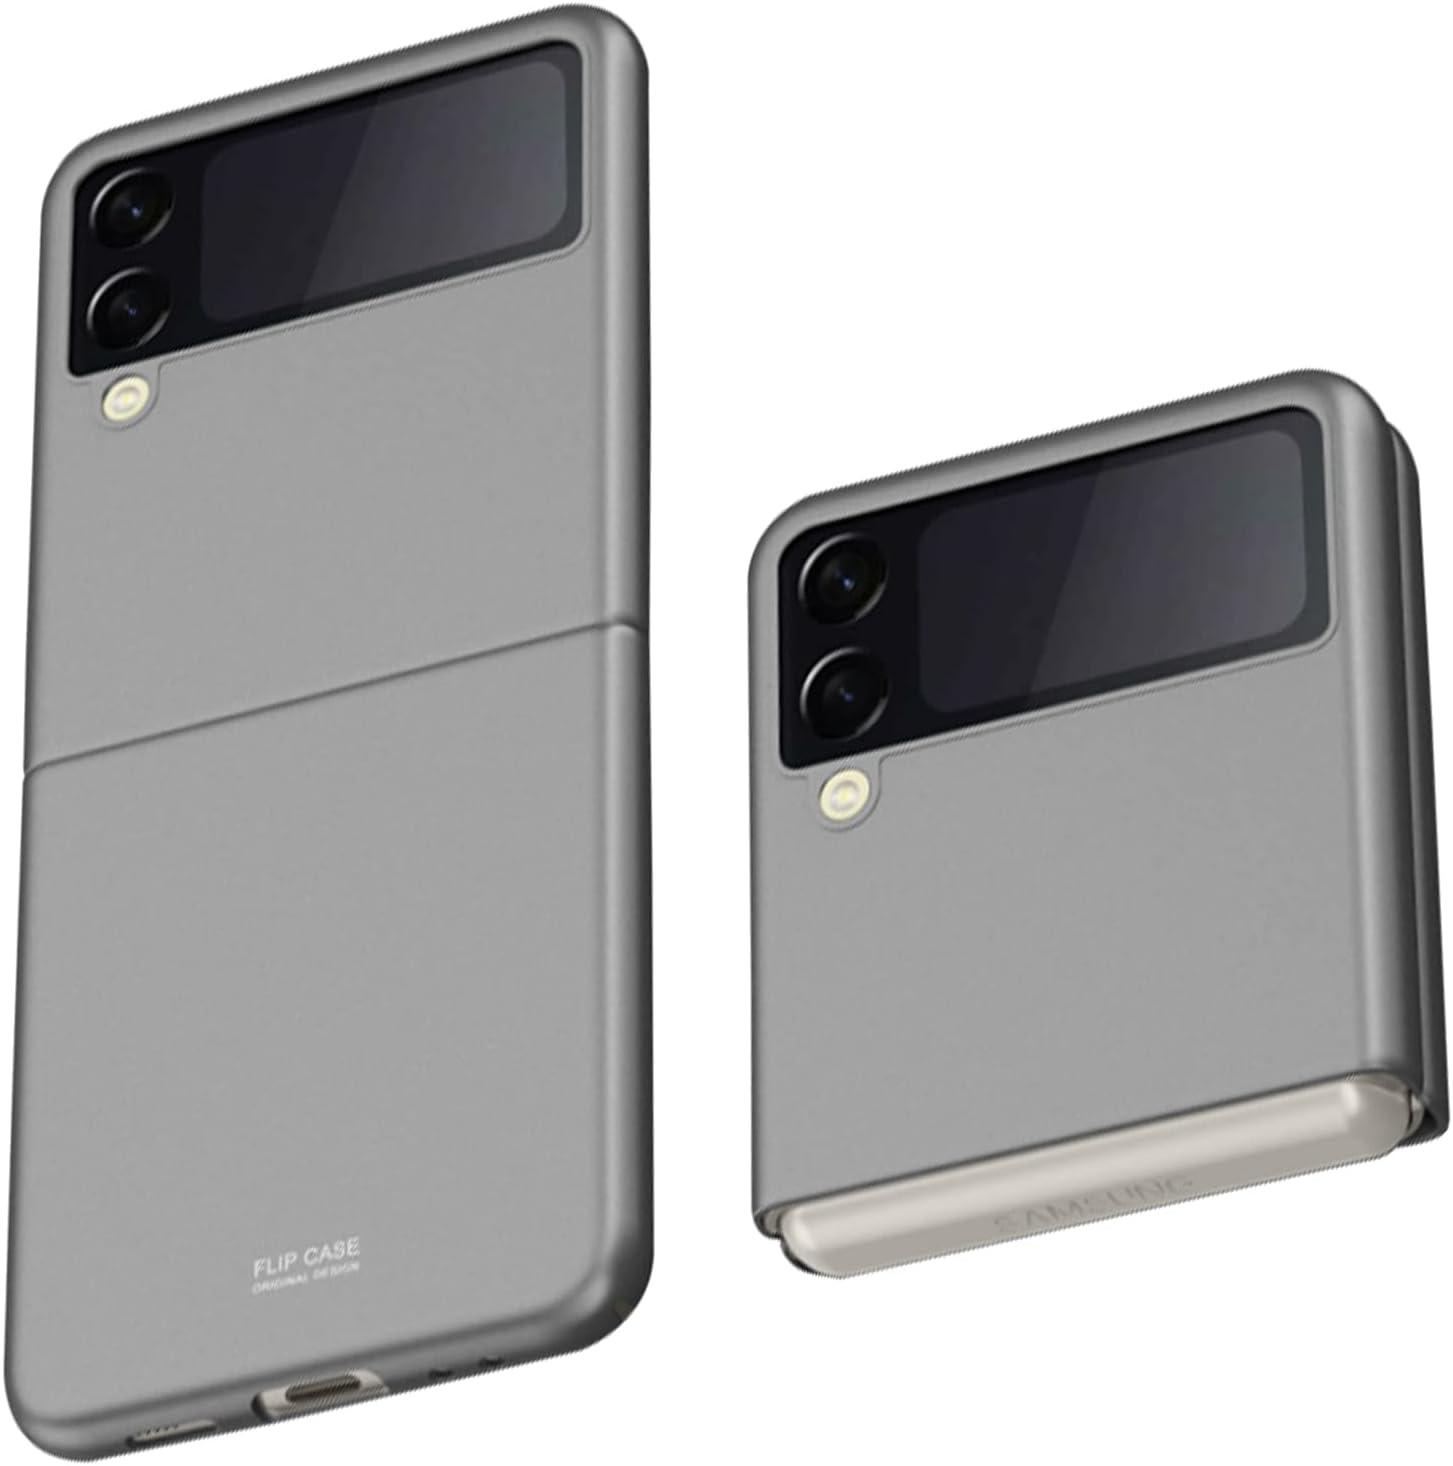 Z Flip 3 Case, Slim fit Samsung z flip 3 case 5G Phone Case Full Protection Cover Hard PC Shockproof Durable Protective Phone Cover for Z Flip3 5G (Gray)